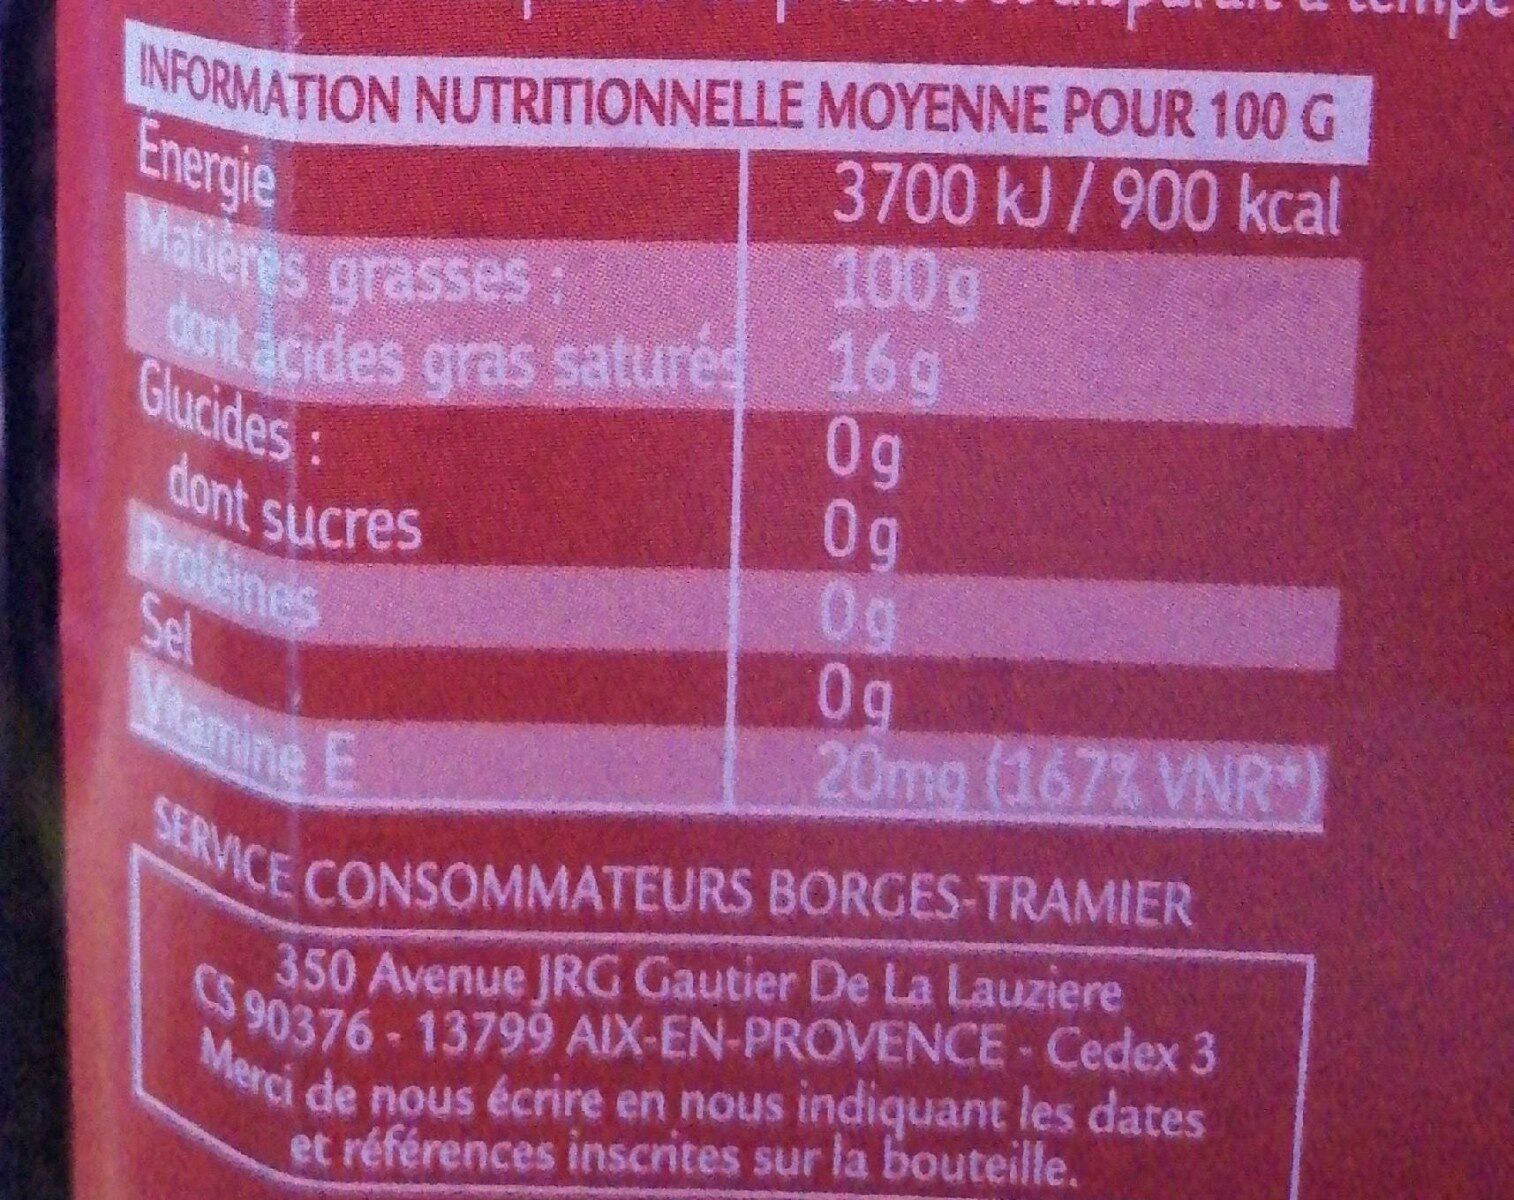 Huile d'olive vierge extra 100 % Olives Hojiblanca - Informations nutritionnelles - fr